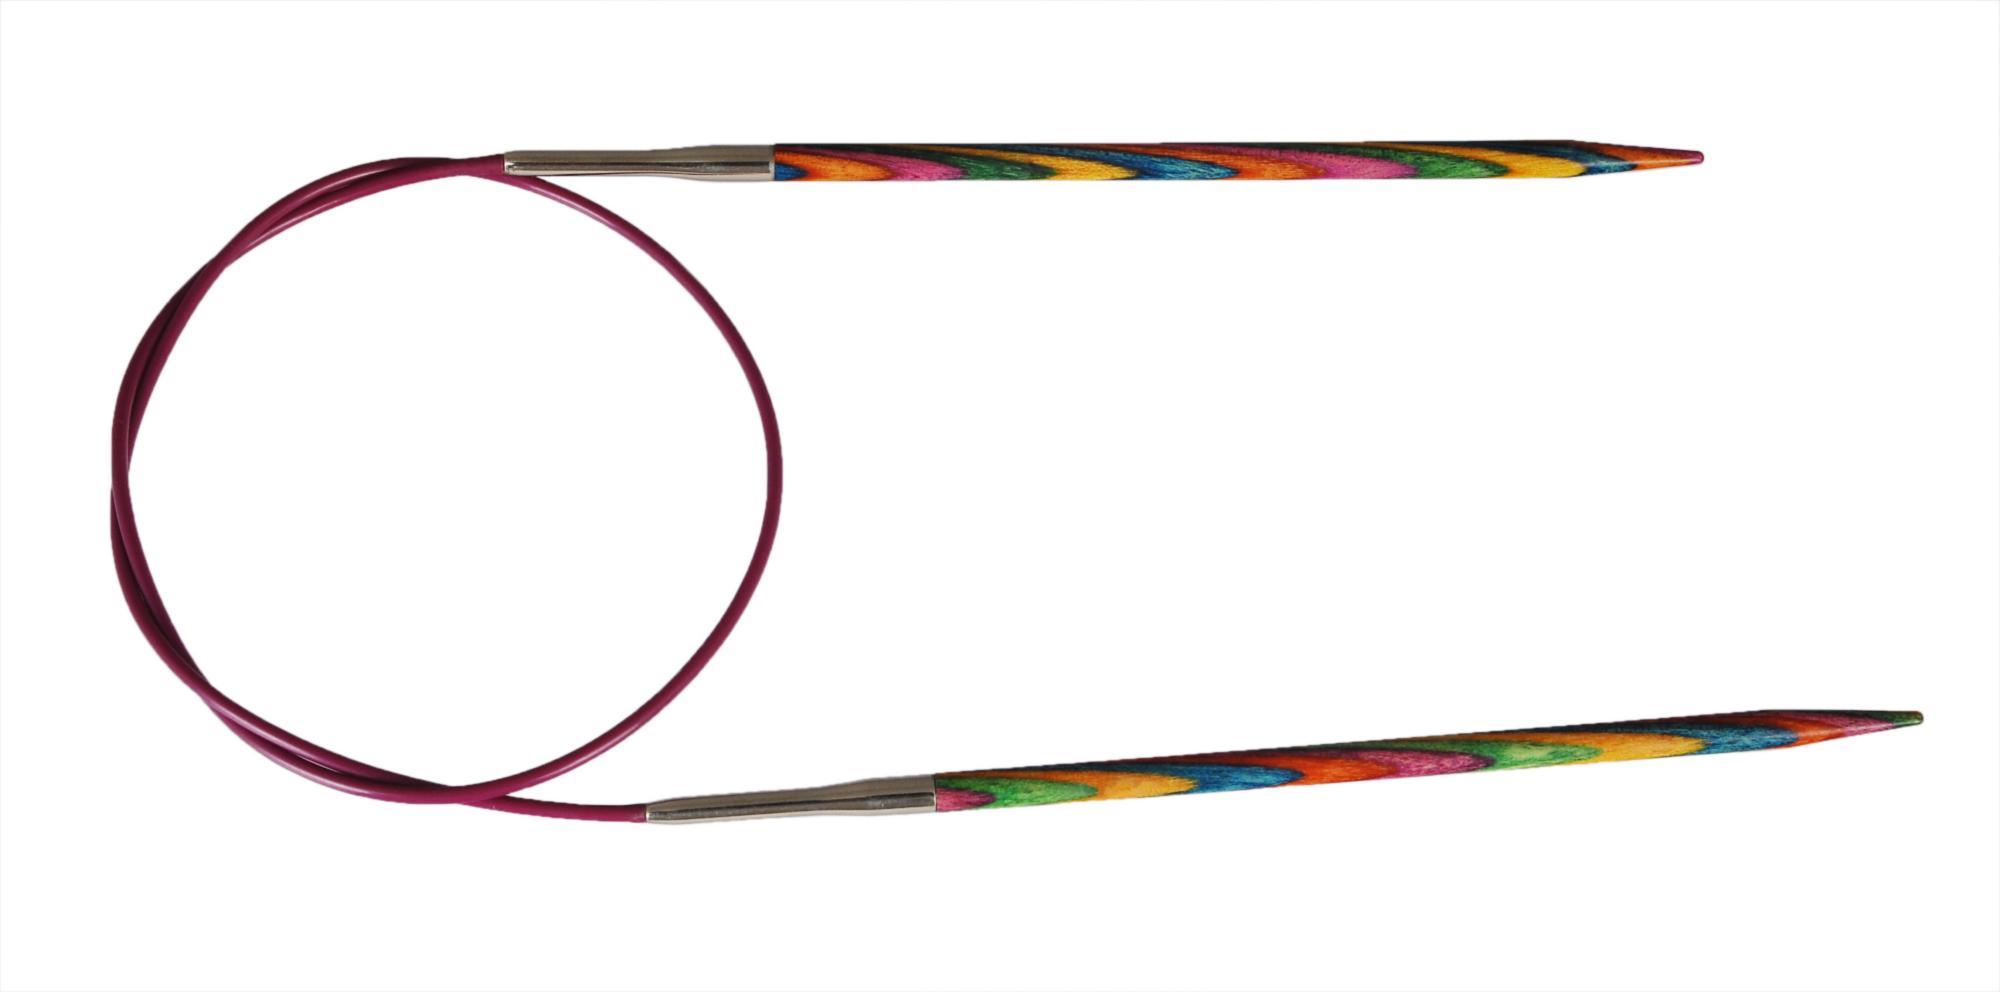 Спицы круговые 60 см Symfonie Wood KnitPro, 21320, 3.50 мм